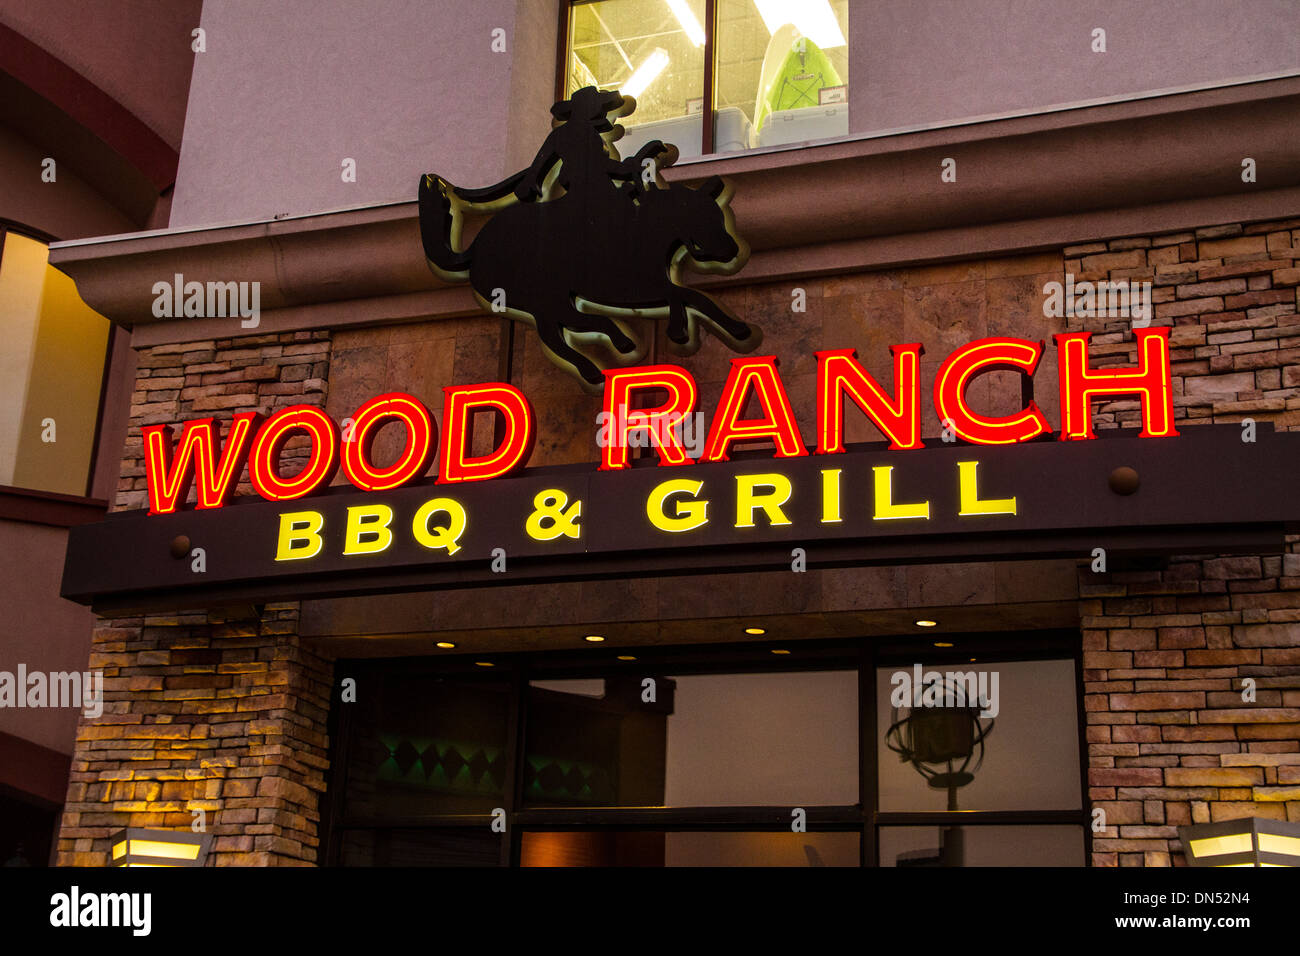 Wood Ranch Northridge WB Designs - Wood Ranch Northridge WB Designs